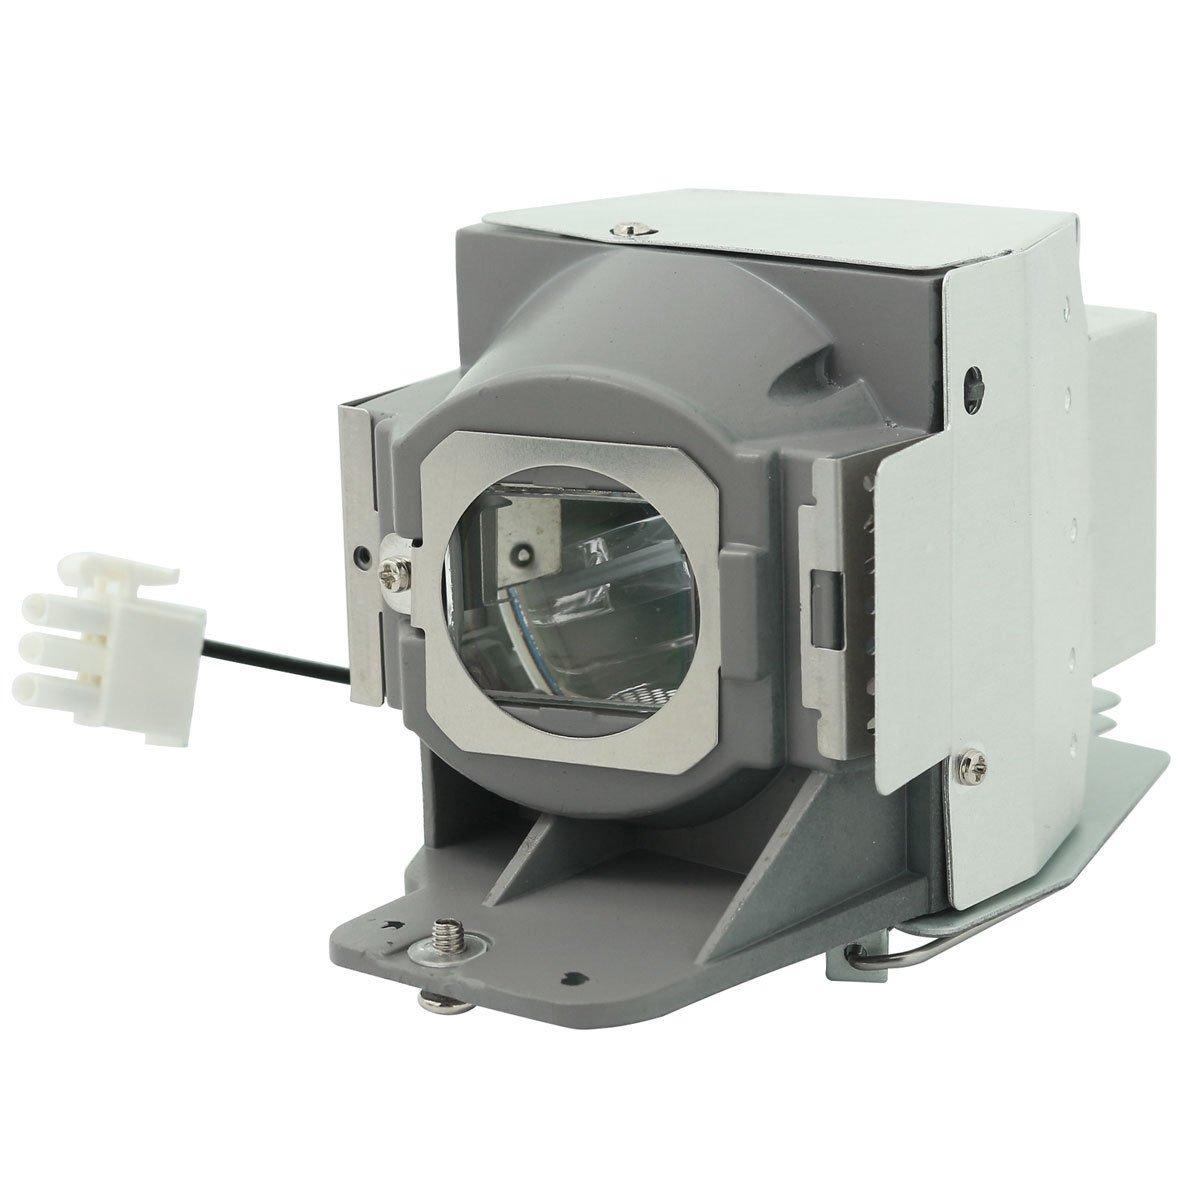 Supermait MC.JFZ11.001 プロジェクター交換用ランプ 汎用 150日間安心保証つき 適用機種: H6510BD / P1500 対応   B0789H2X1S